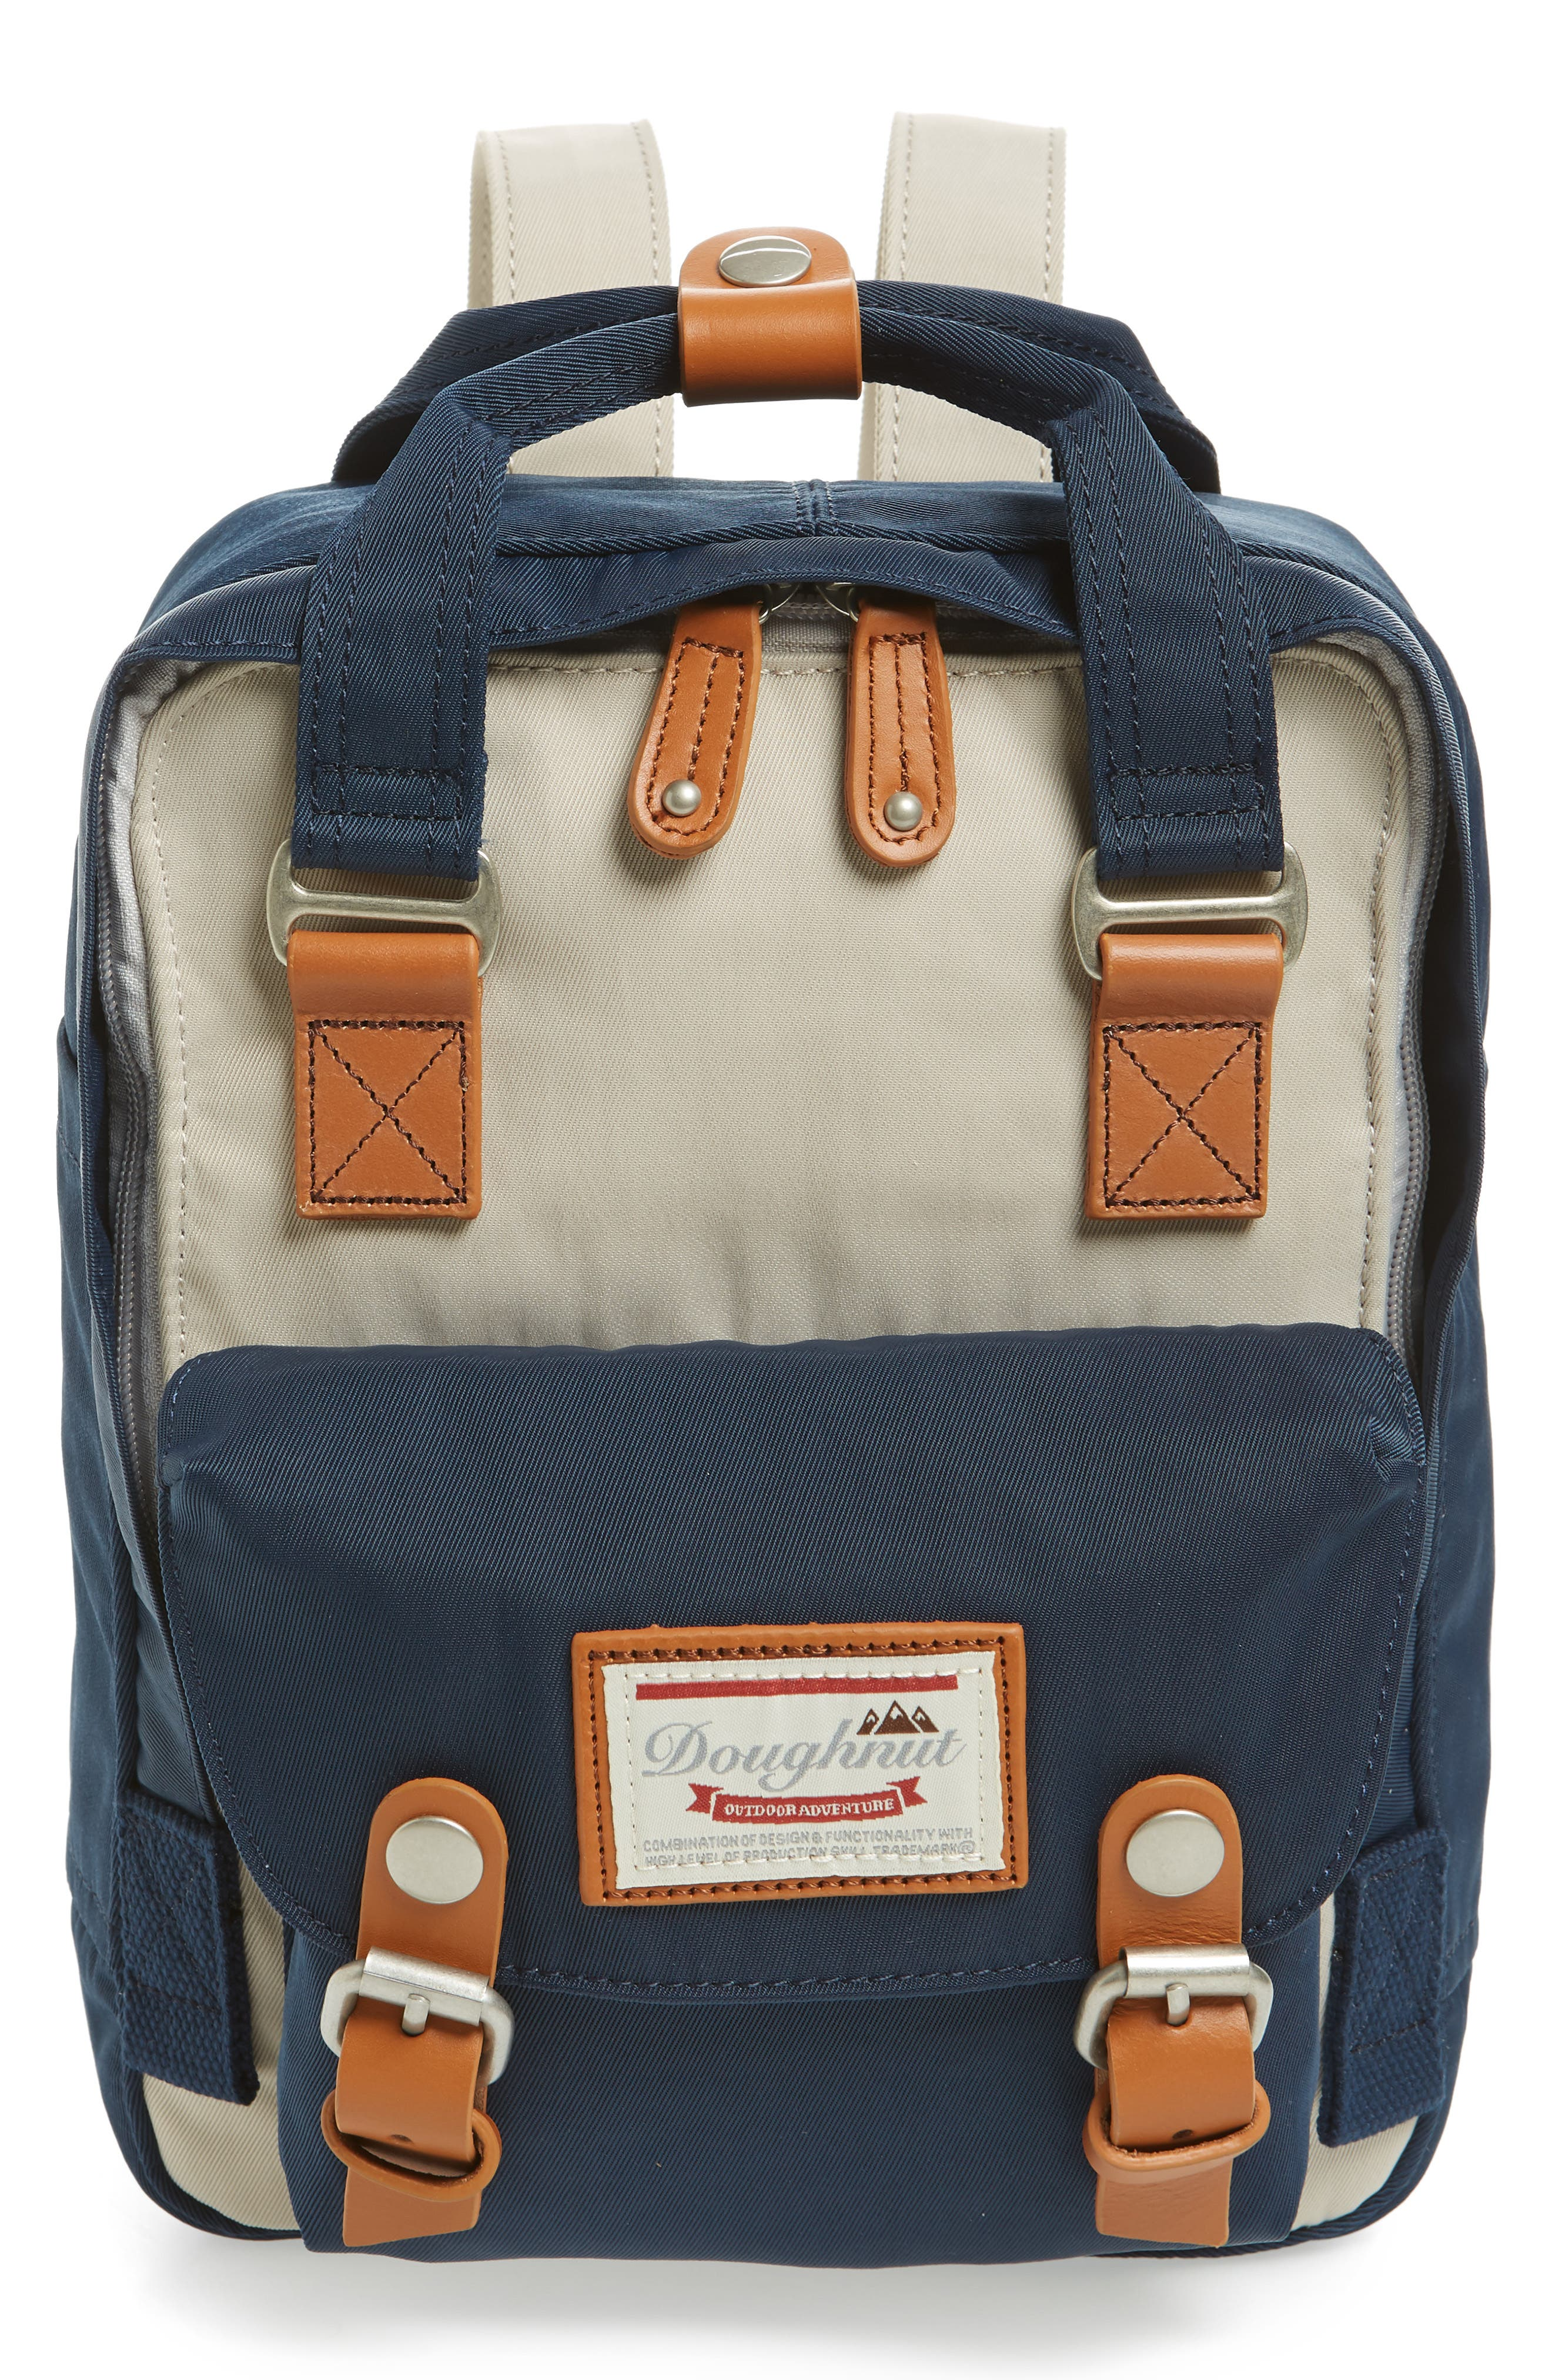 DOUGHNUT Mini Macaroon Colorblock Water Resistant Backpack - Ivory in Ivory/ Navy